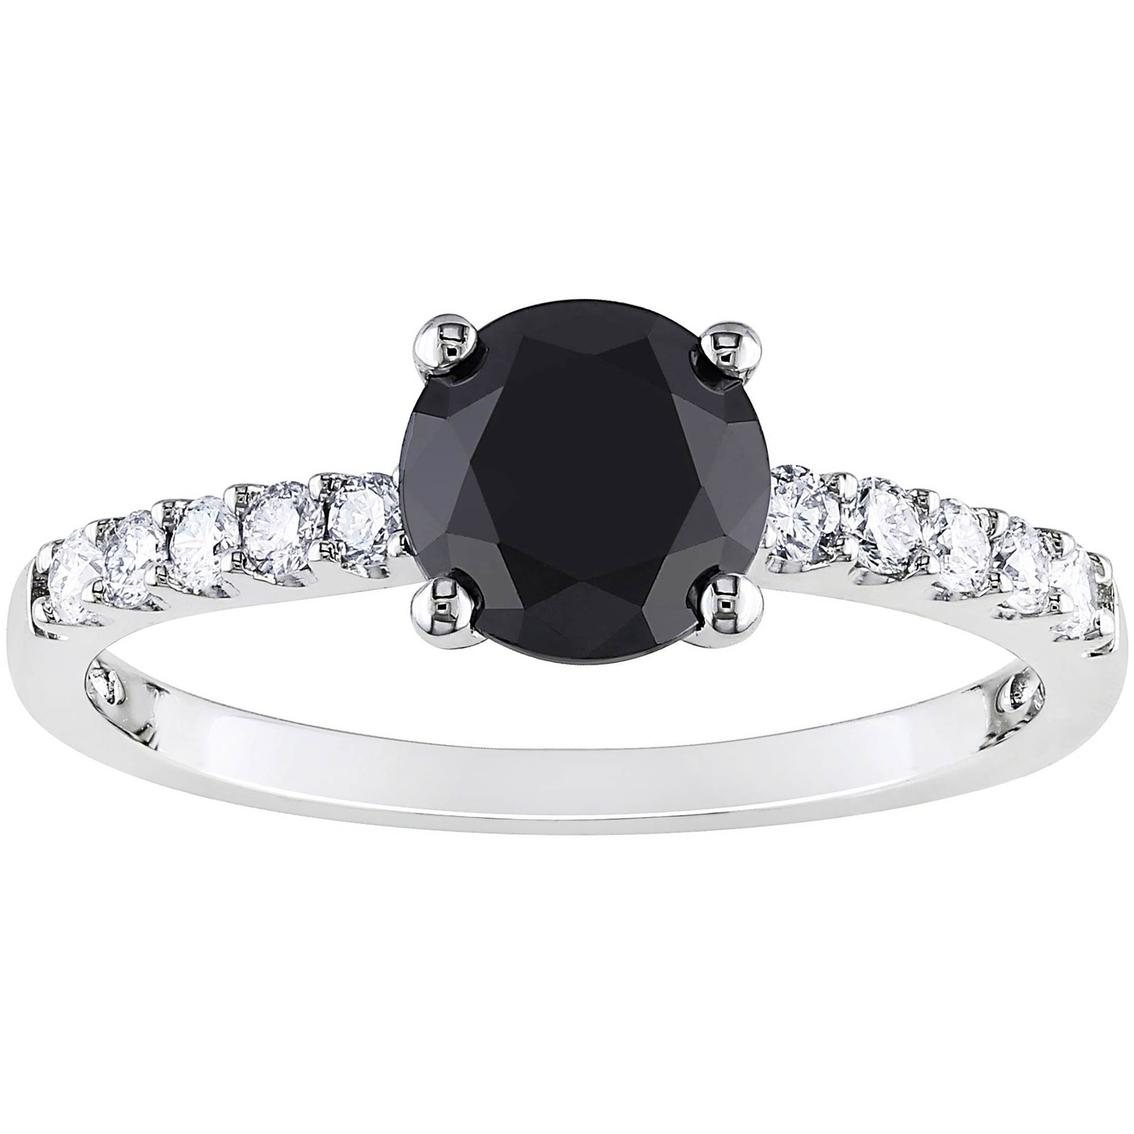 9mm Wedding Band 1 4 Ct Tw Black Diamonds Stainless Steel: Diamore 14k White Gold 1 1/4 Ctw Black And White Diamond